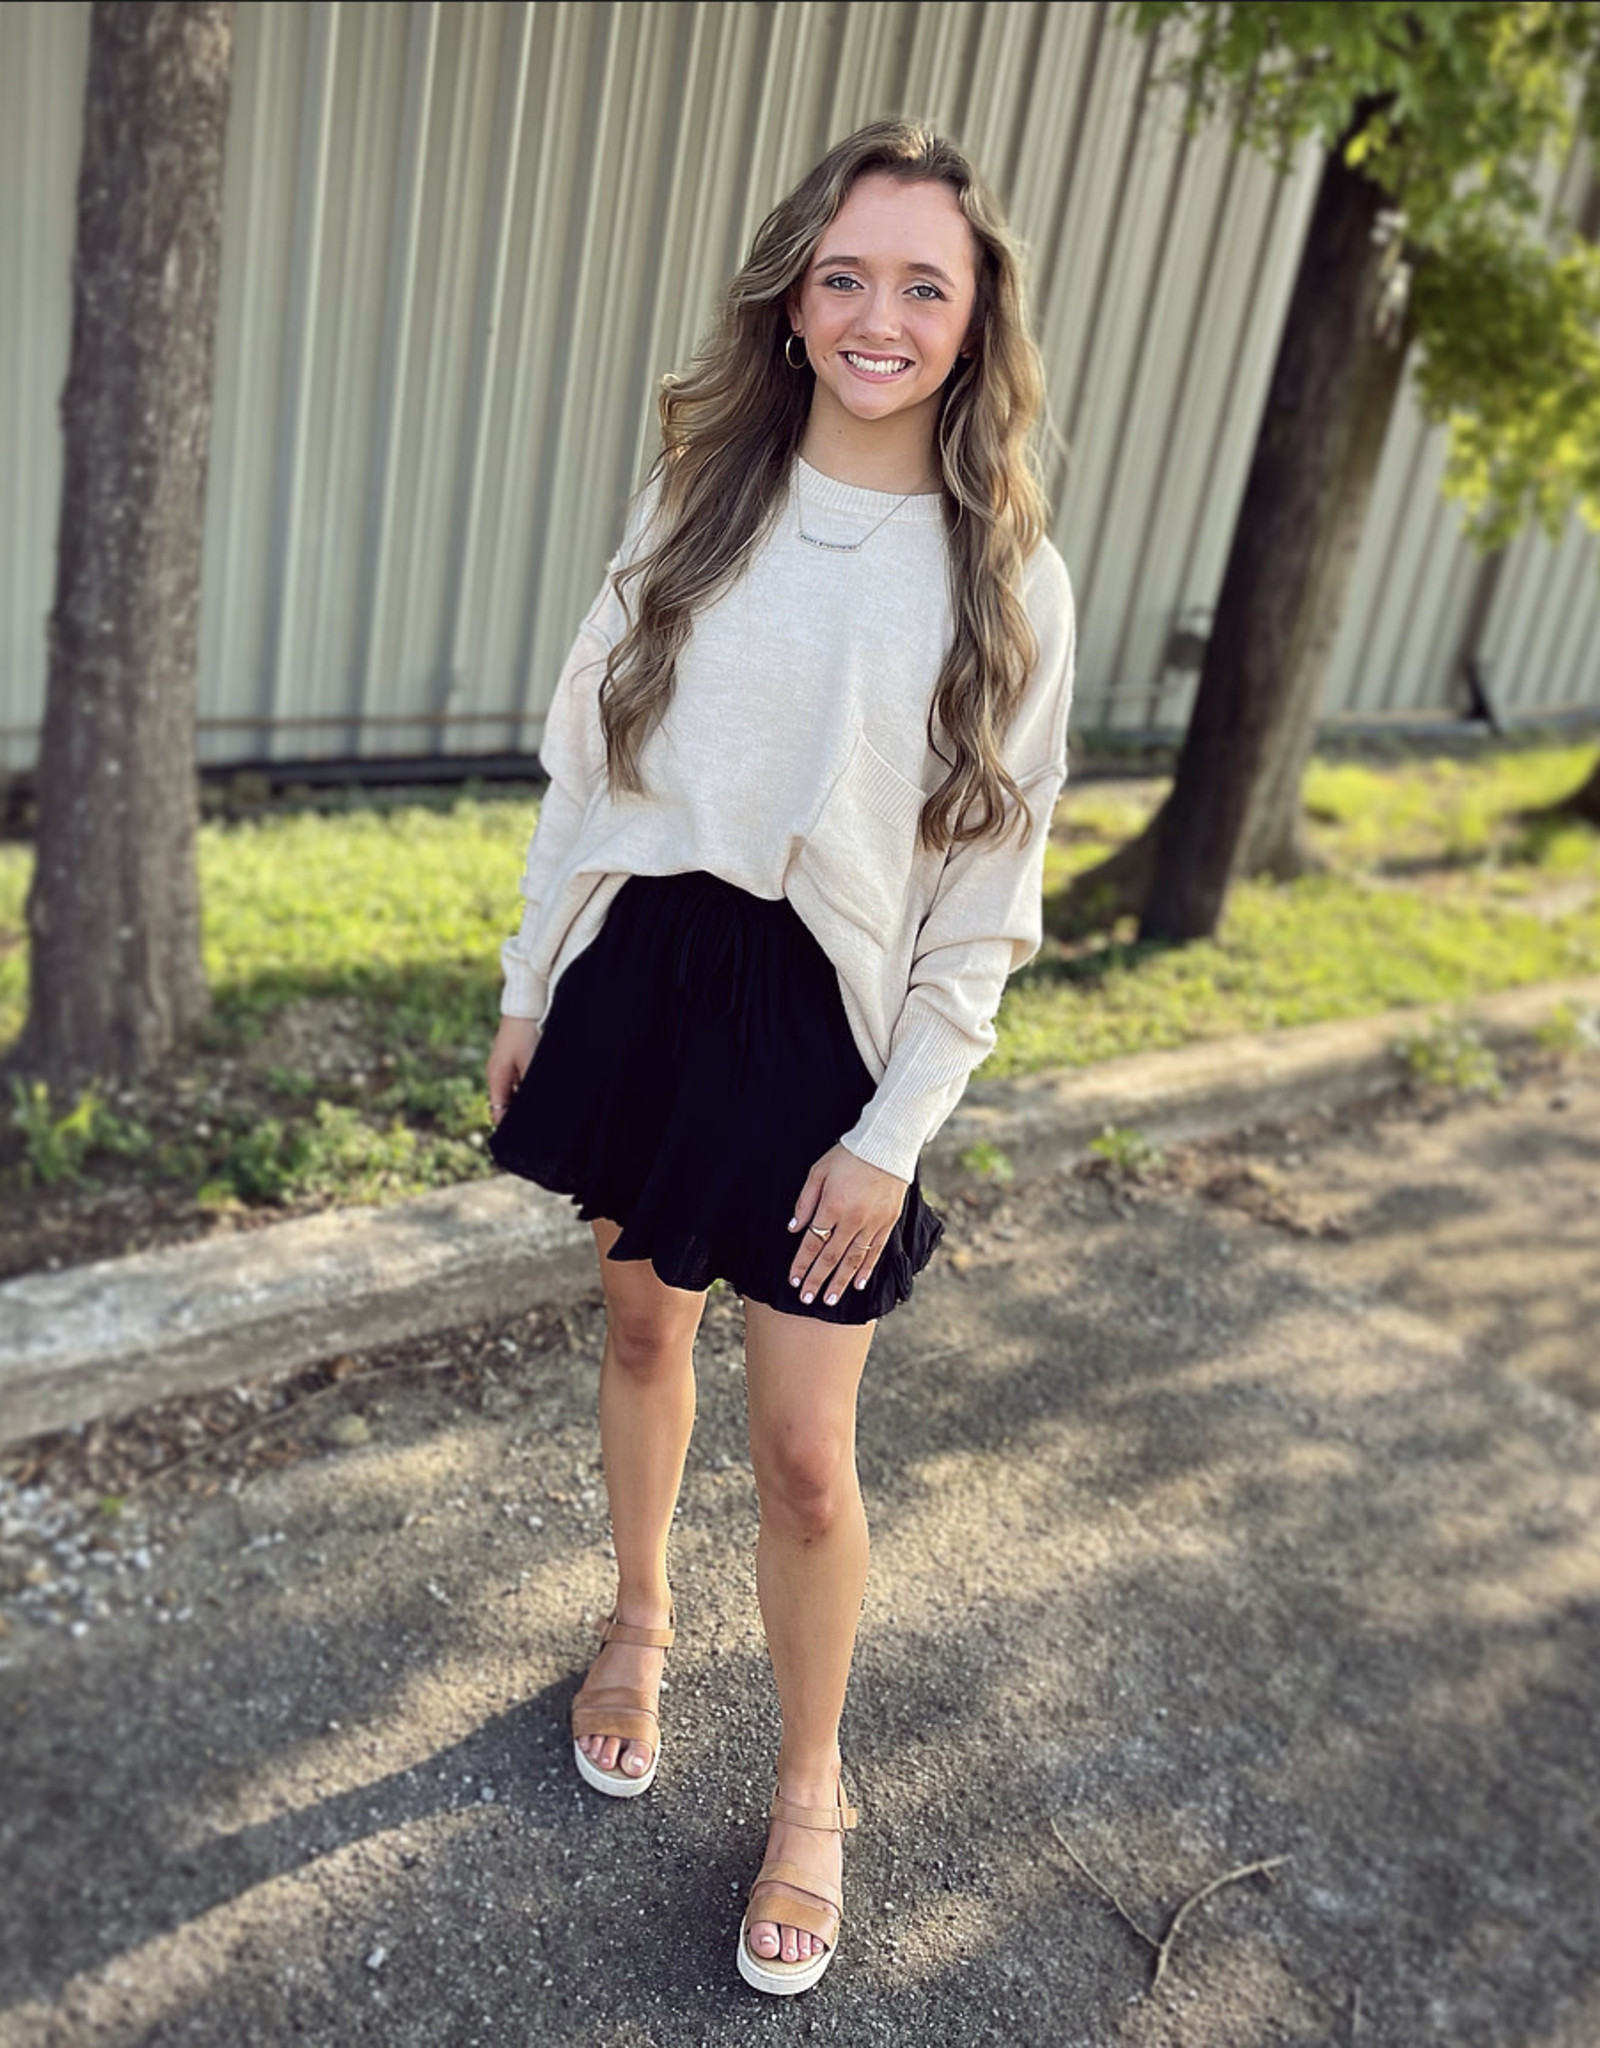 Katie Skirt in Black